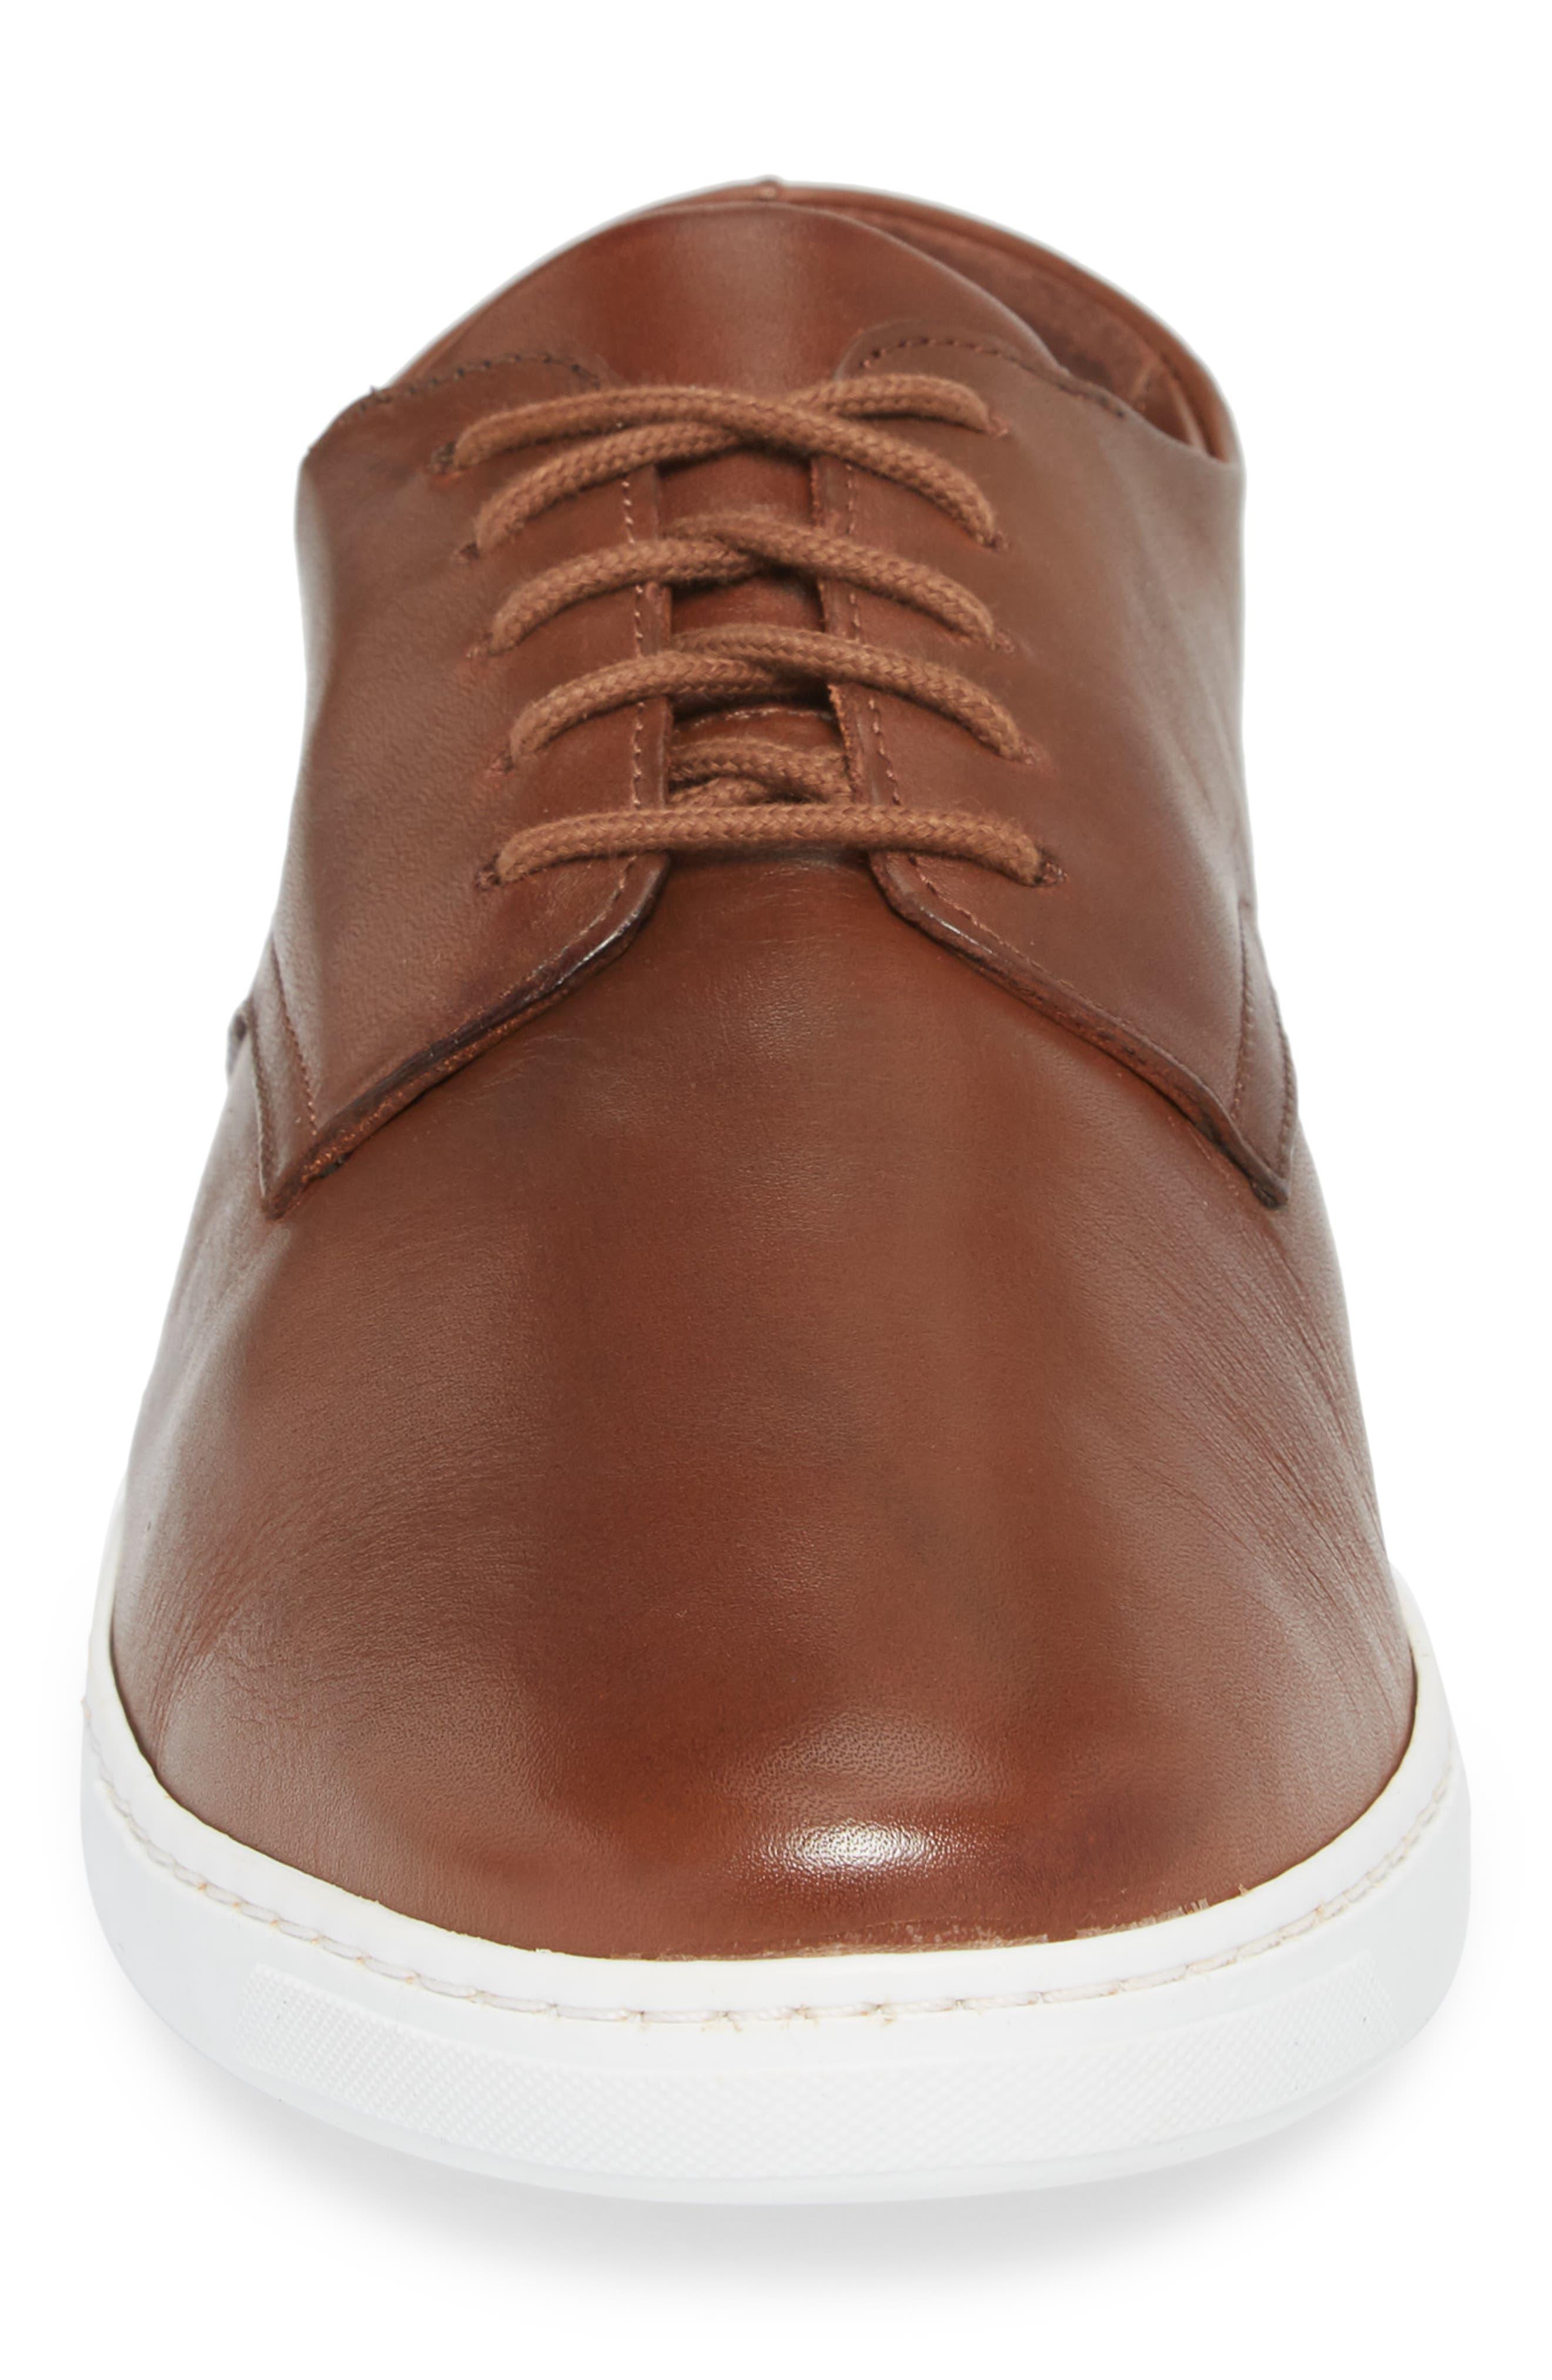 Nok Derby Sneaker,                             Alternate thumbnail 4, color,                             Brown Leather